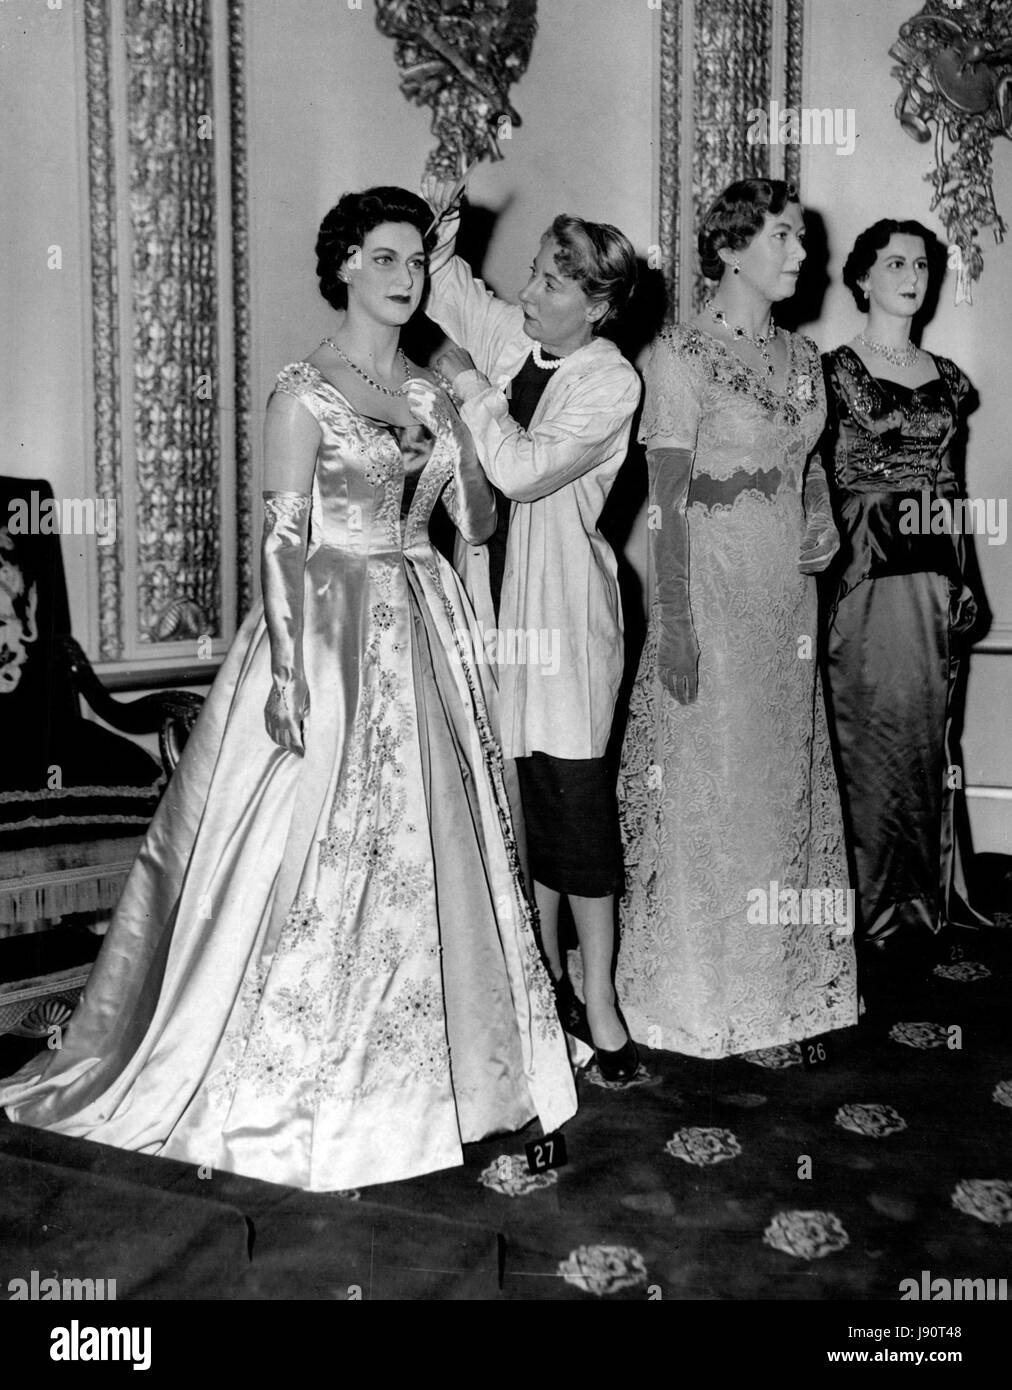 Mar. 03, 1956 - new Royal Models at Tussaud's: New models of the Queen. Princess Margaret and Princess Royal, were Stock Photo